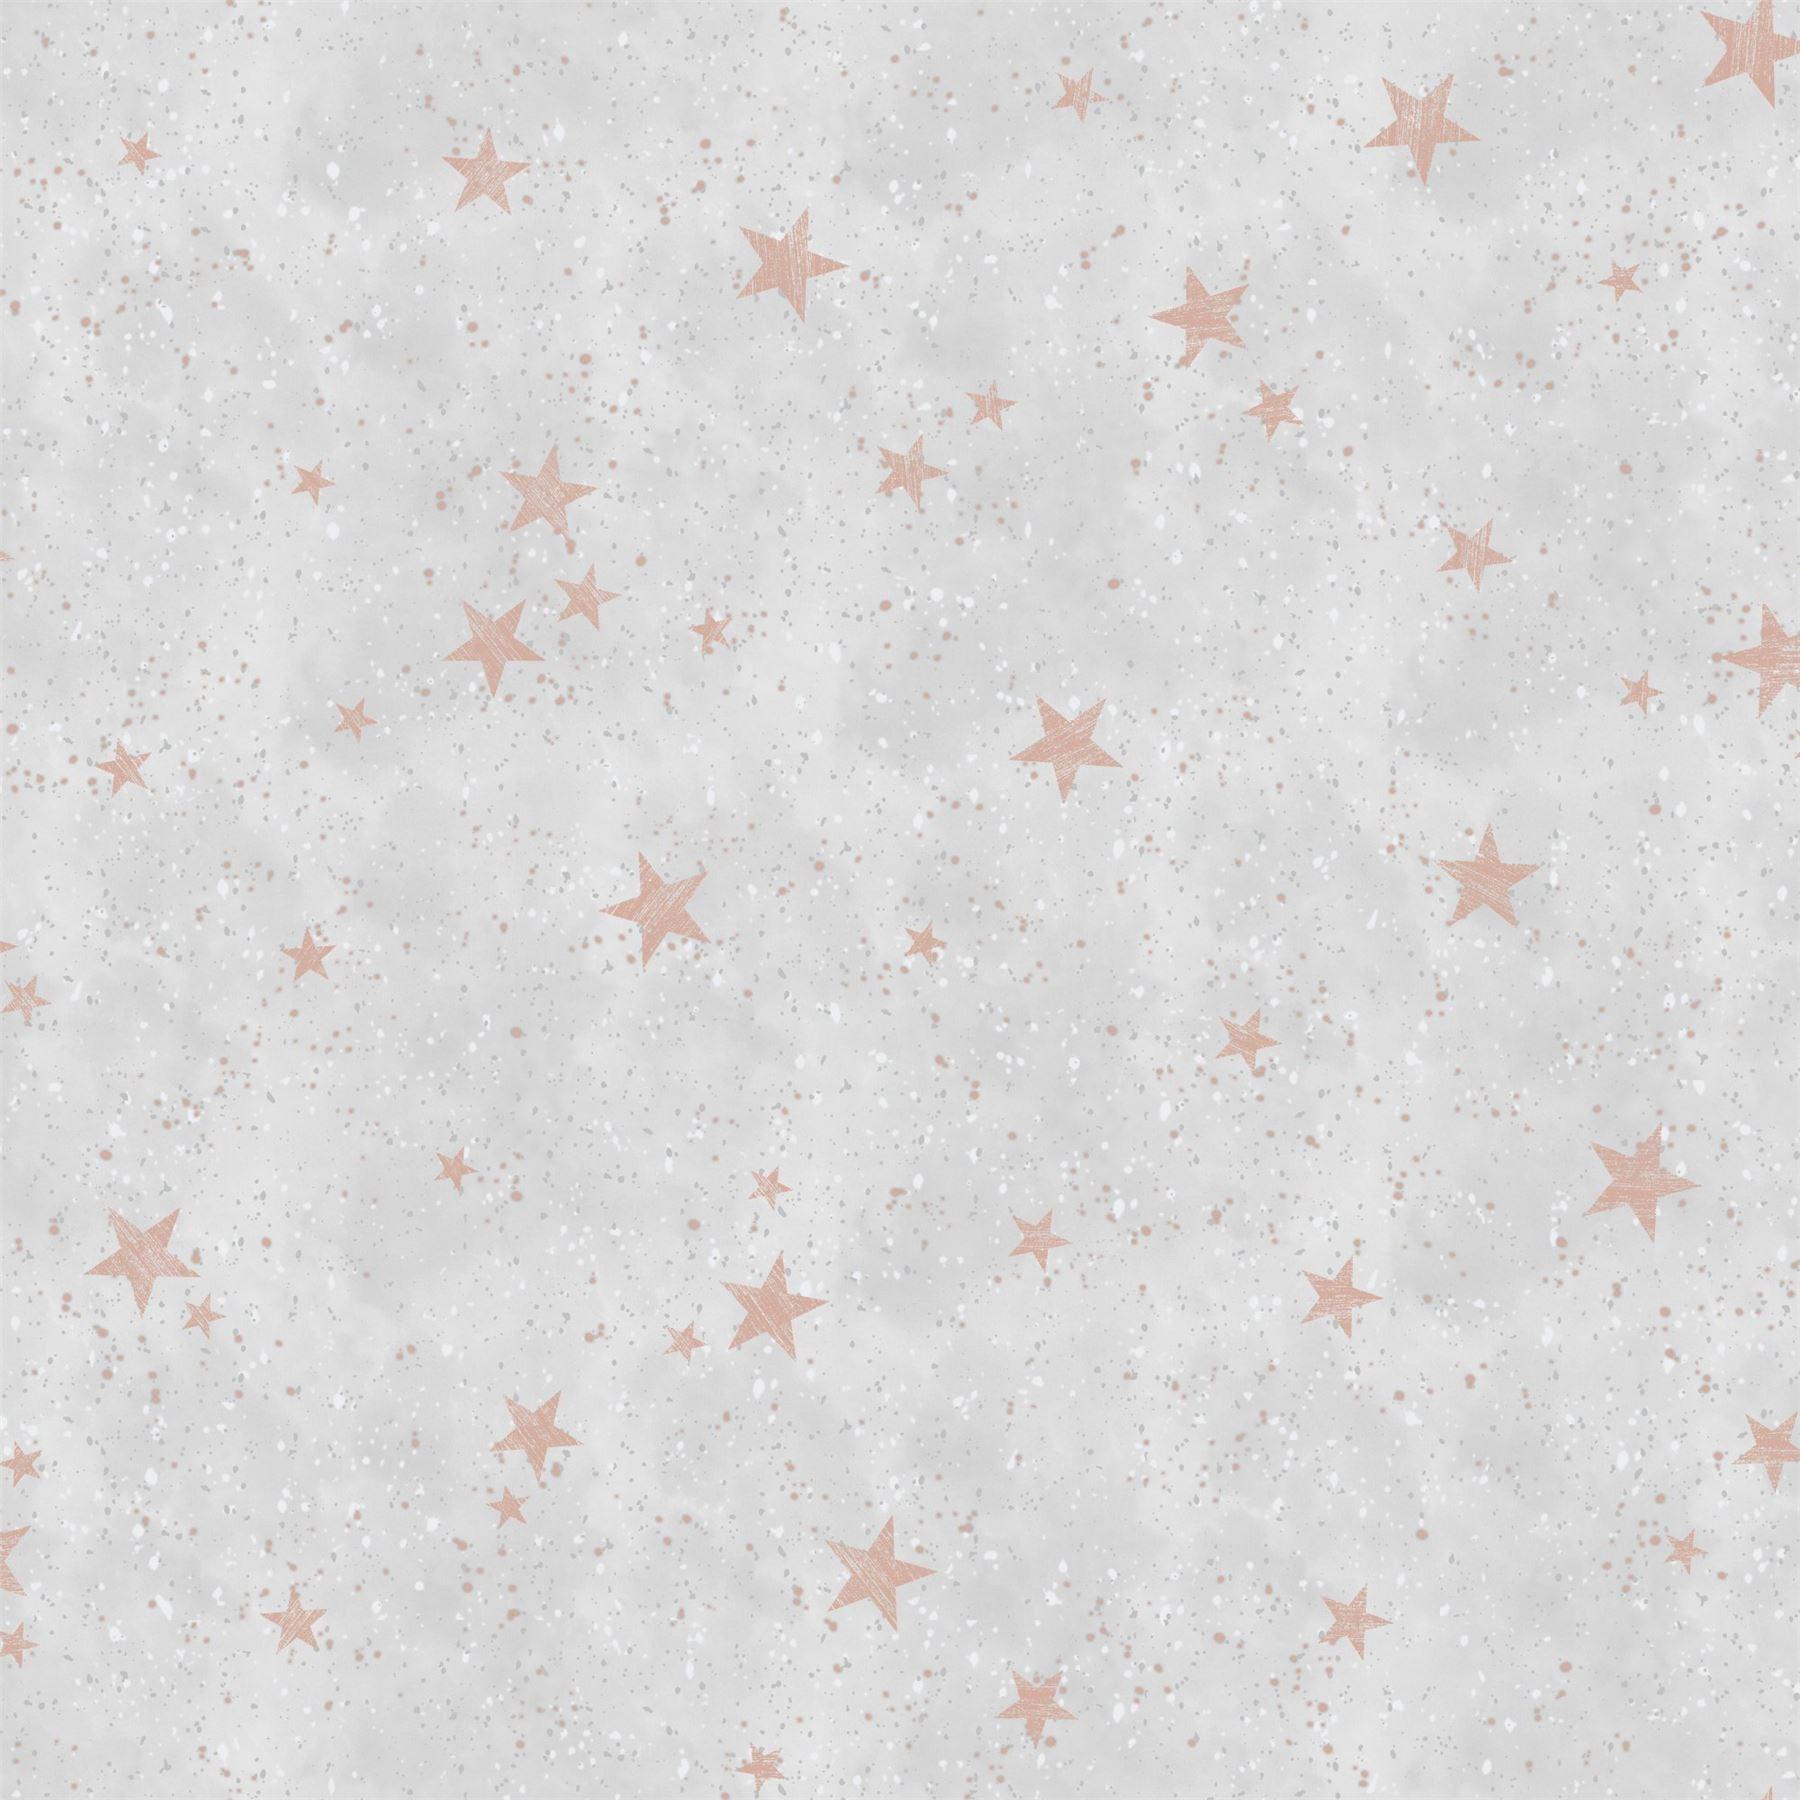 Details About Starlight Stars Rose Gold Wallpaper Grey White Metallic Shimmer Childrens